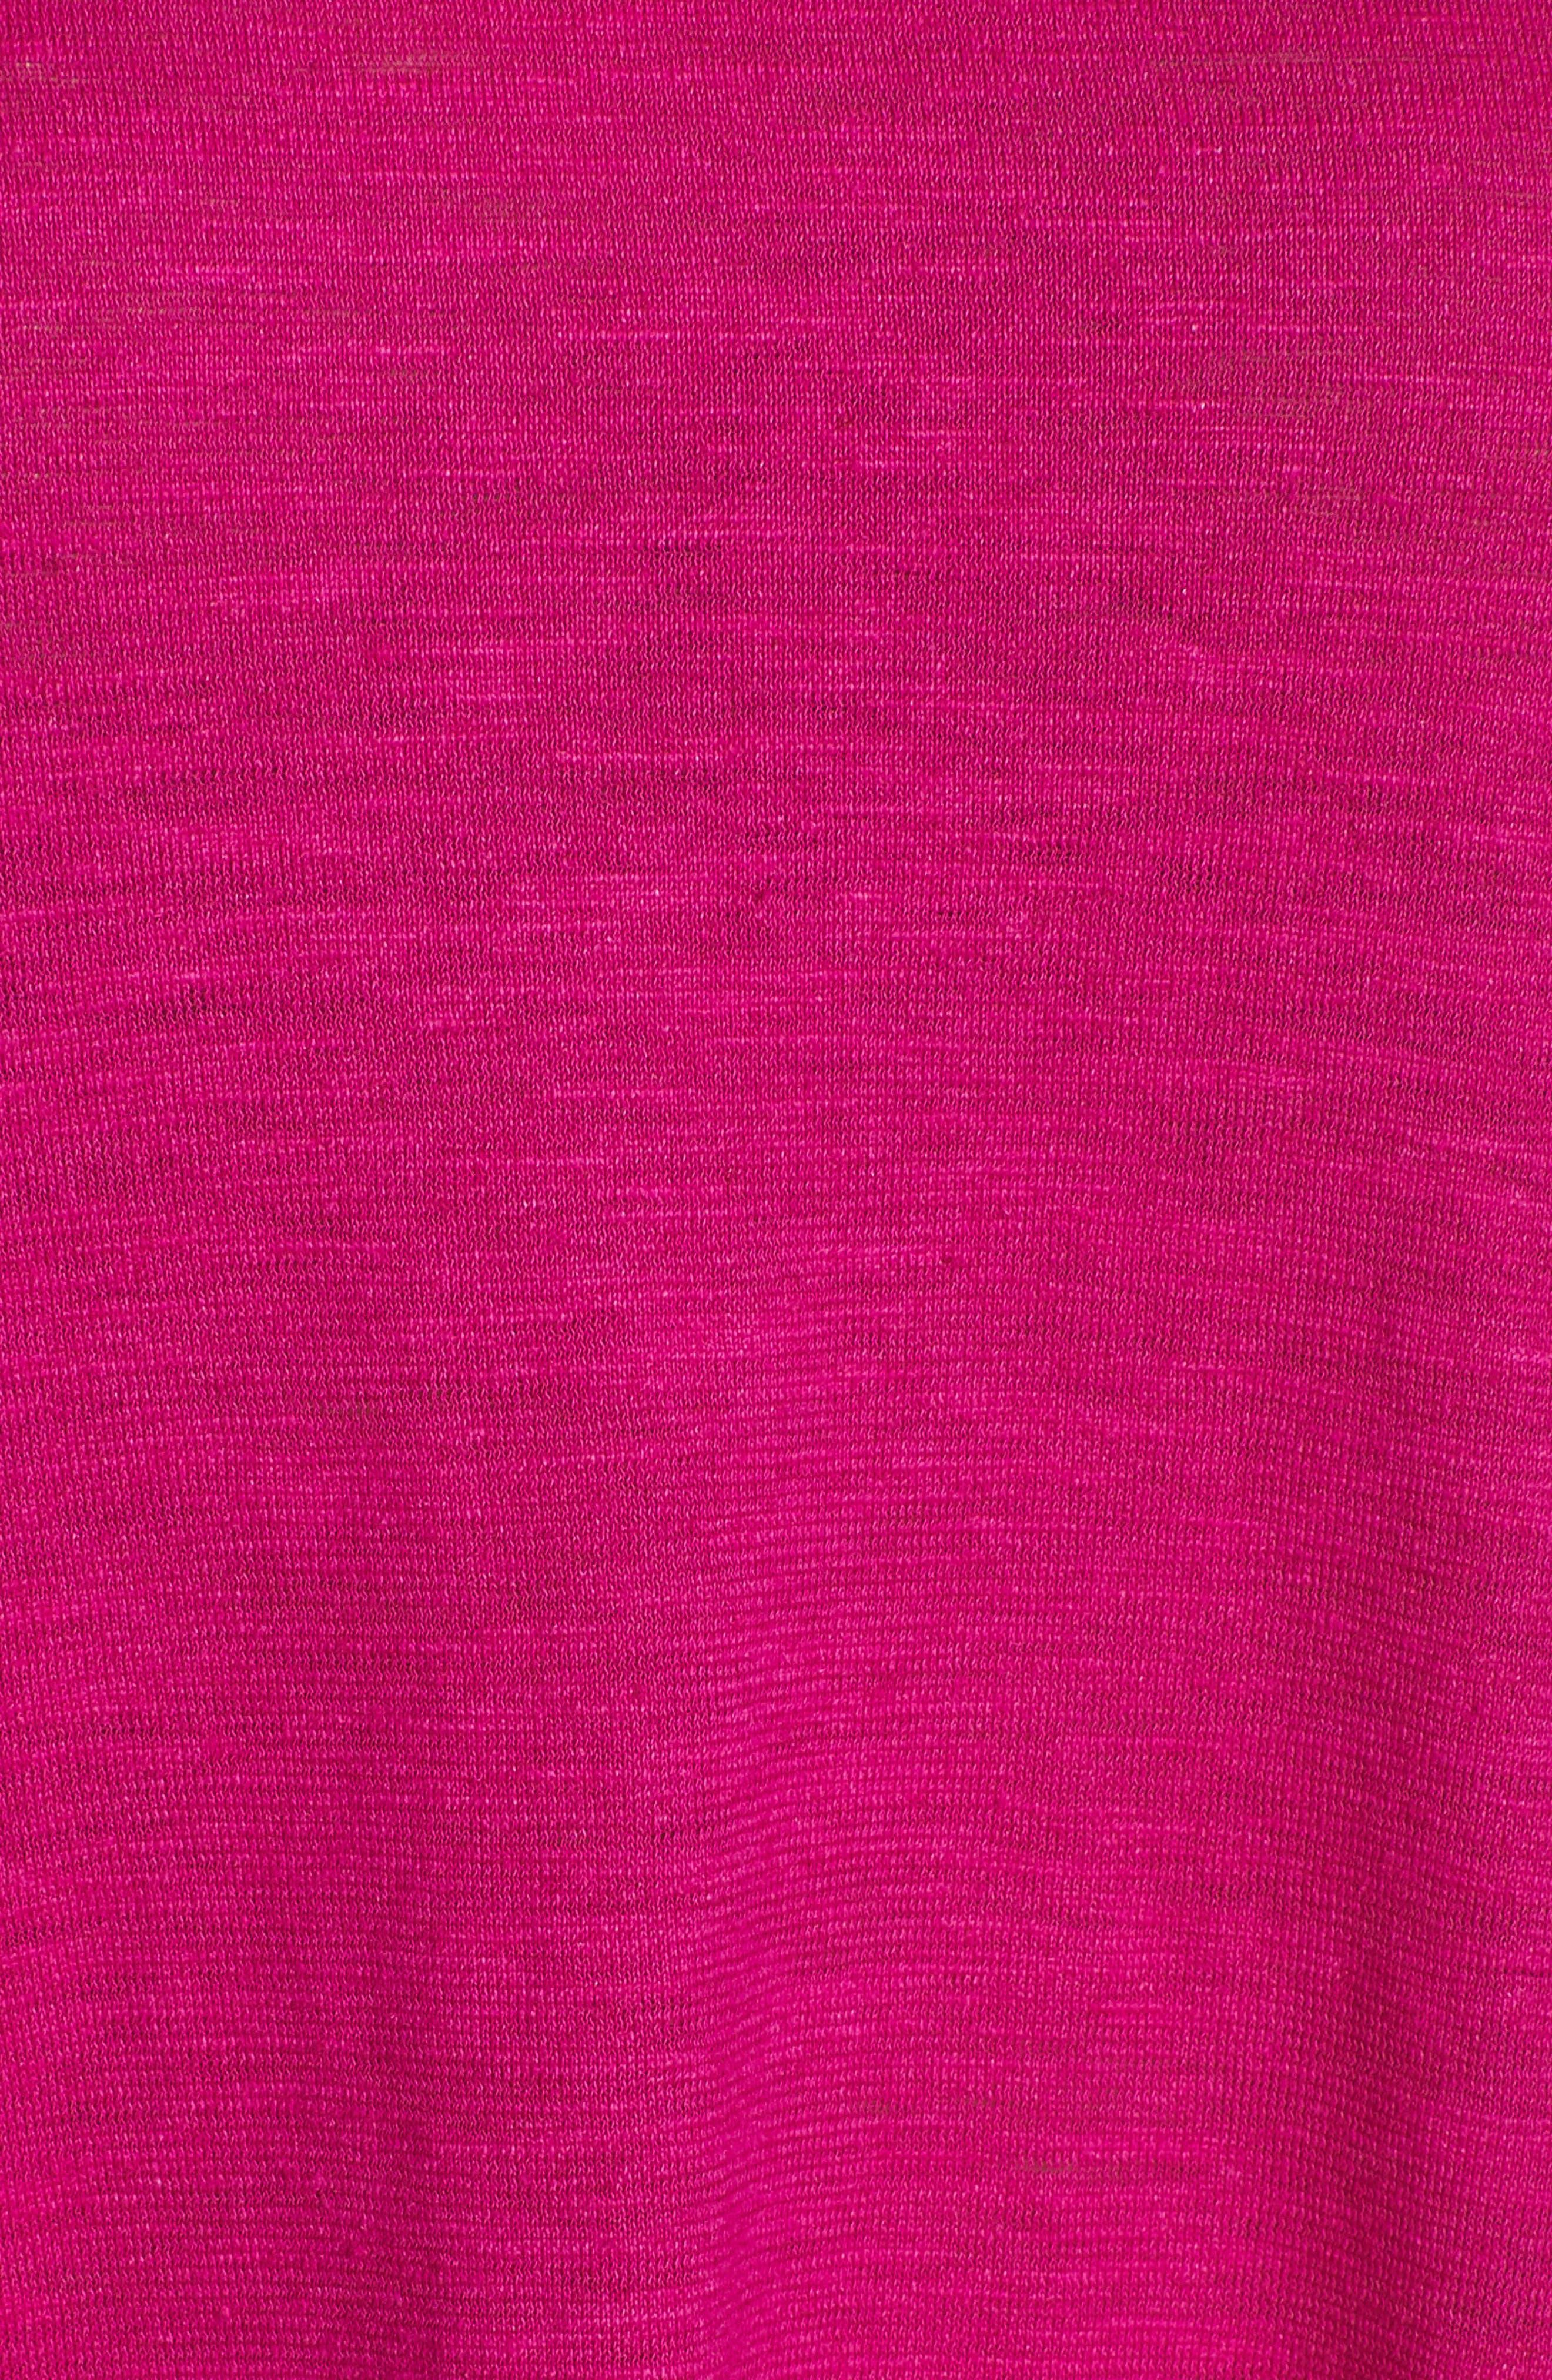 Asymmetrical Hemp Blend Shift Dress,                             Alternate thumbnail 16, color,